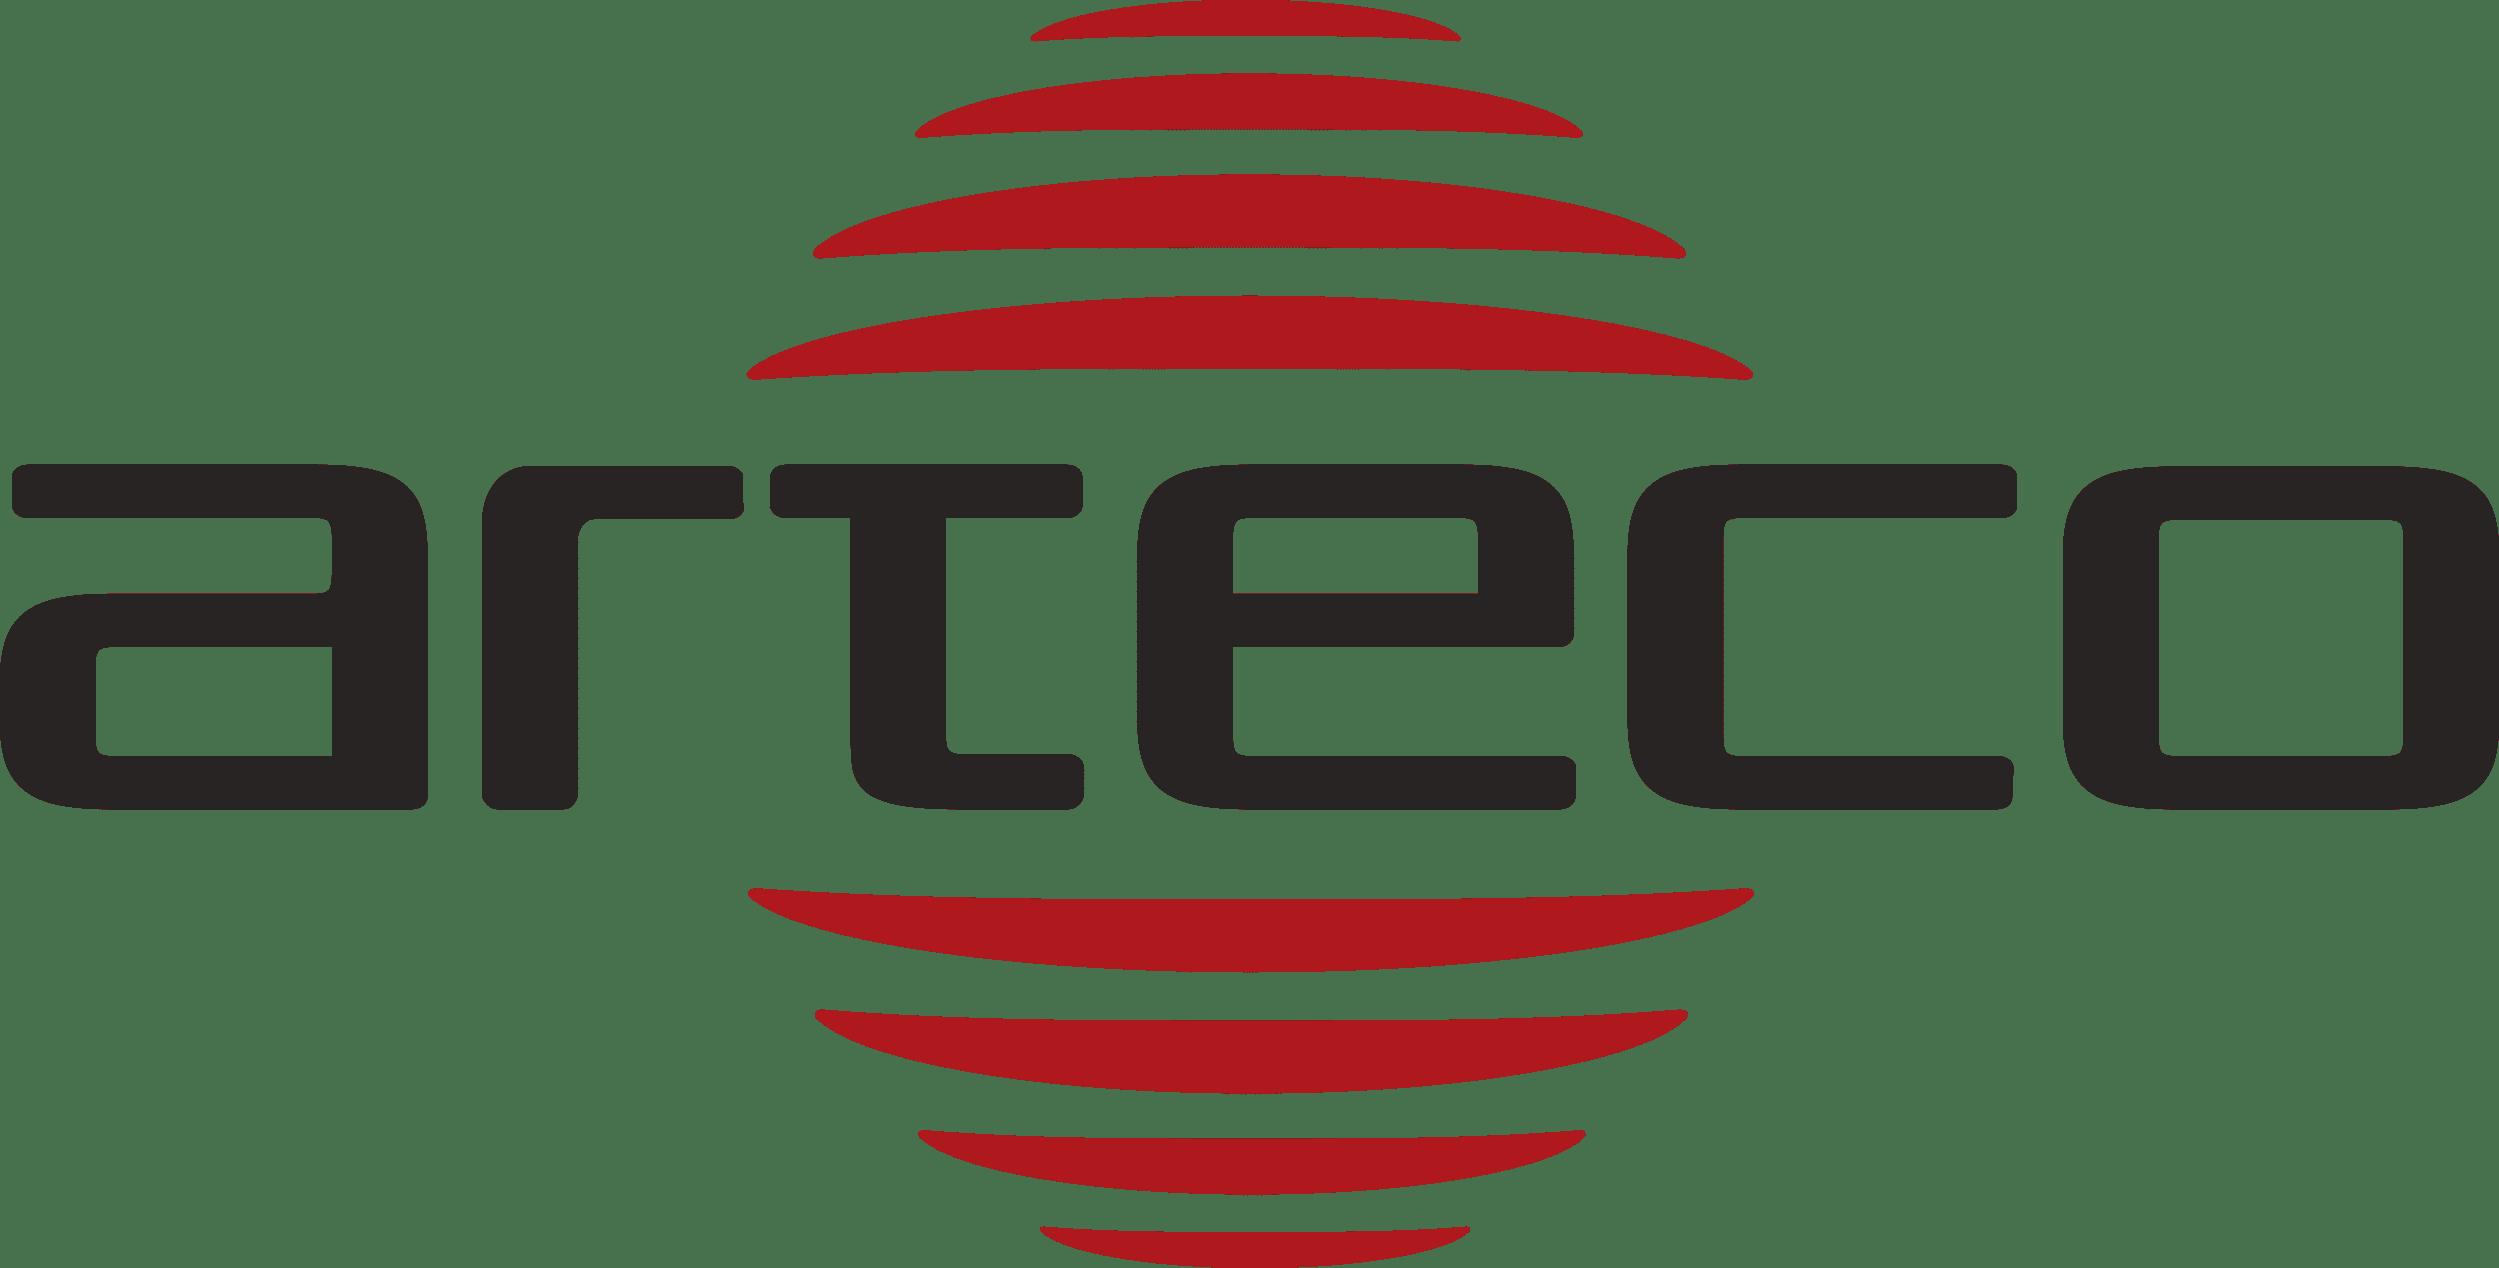 logo arteco_dinets001